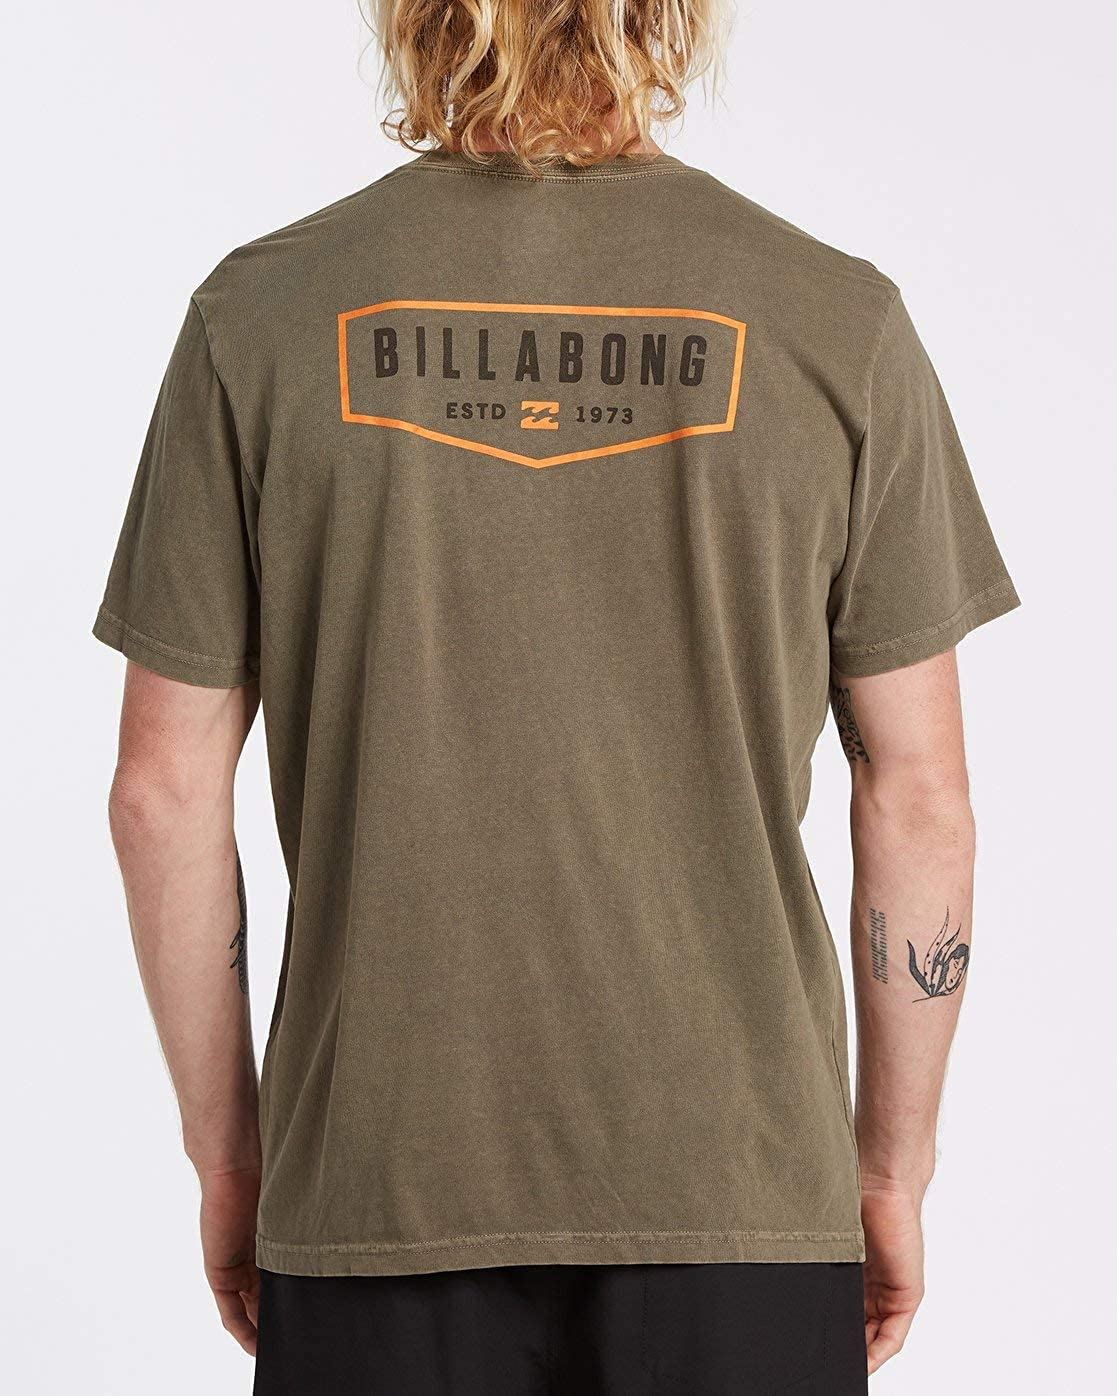 Billabong General Camiseta de manga corta - Verde - Medium ...